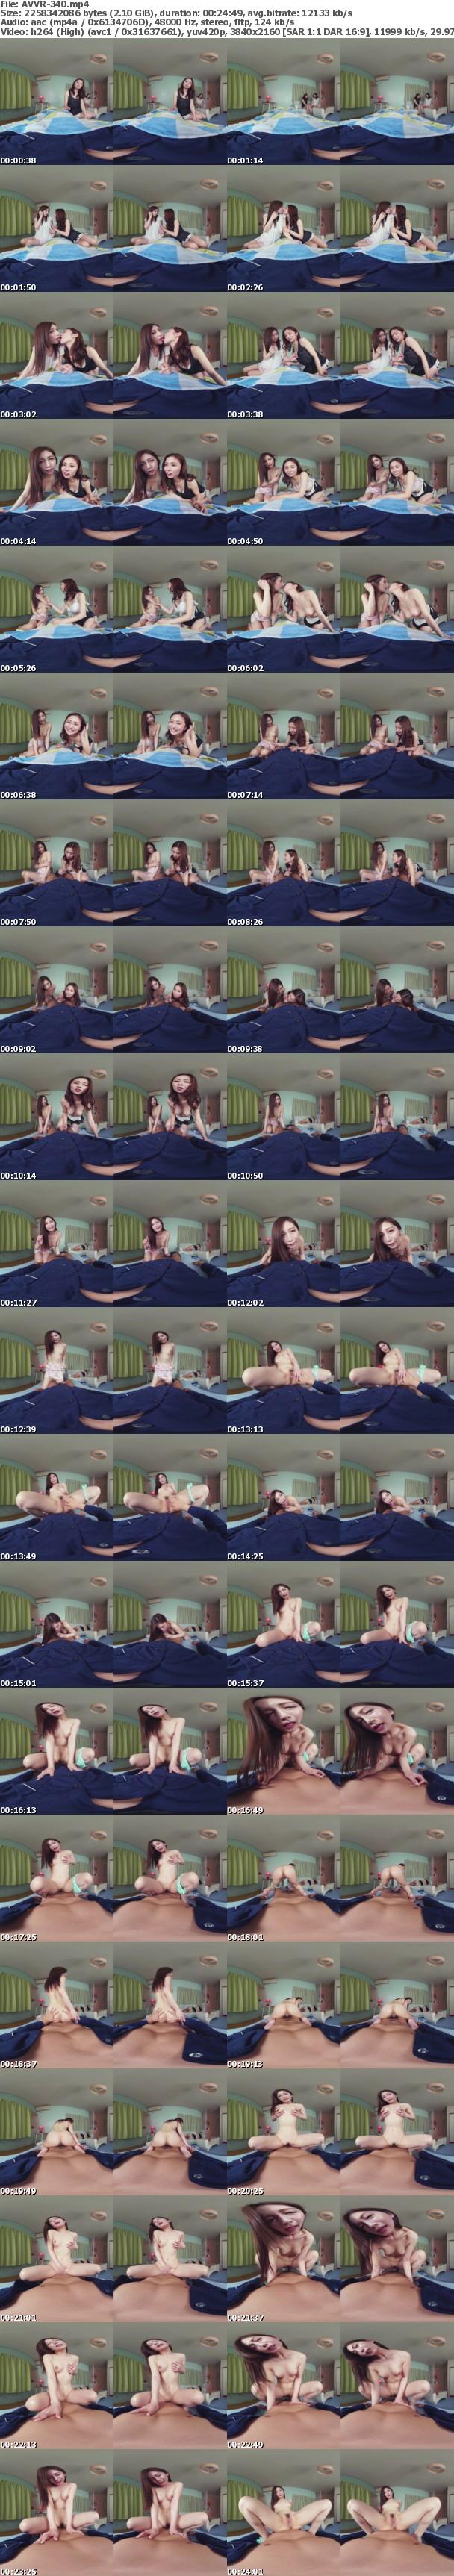 VR/3D [AVVR-340] 【VR】嫁の寝てる間に…こっそりネトラレ不倫中出しSEX 佐々木あき 共演 前田可奈子